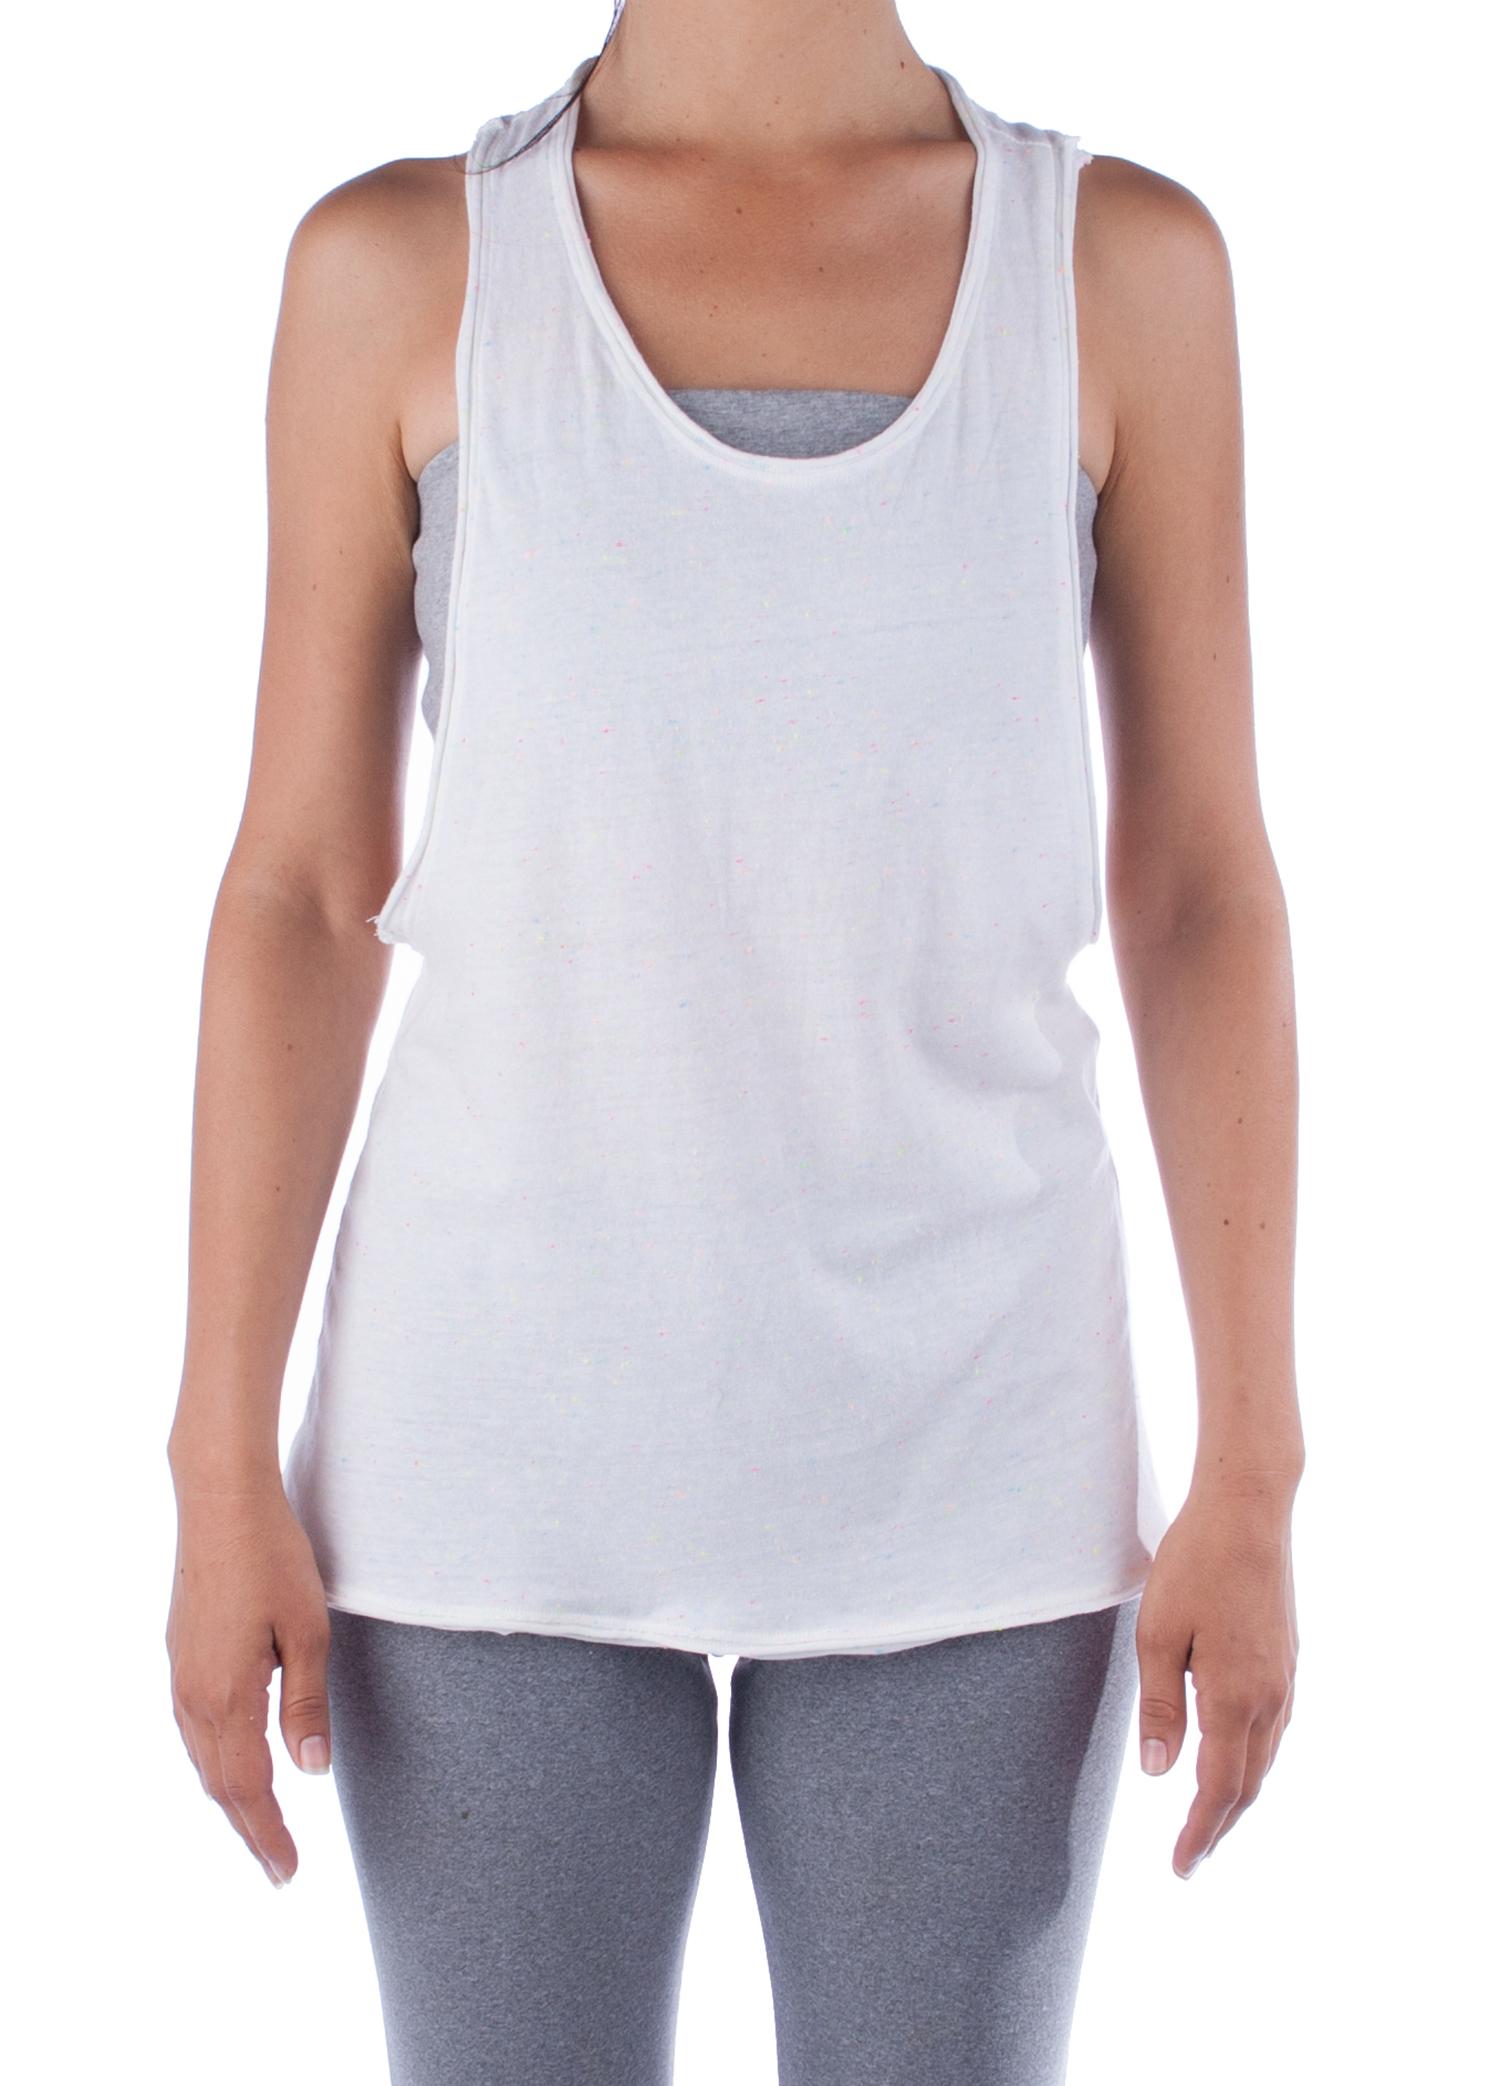 006d90a90842e3 ... Organic Cotton Yoga Vest - Loose Racerback Yoga Tank - Candy Sprinkled  White Yoga Top -